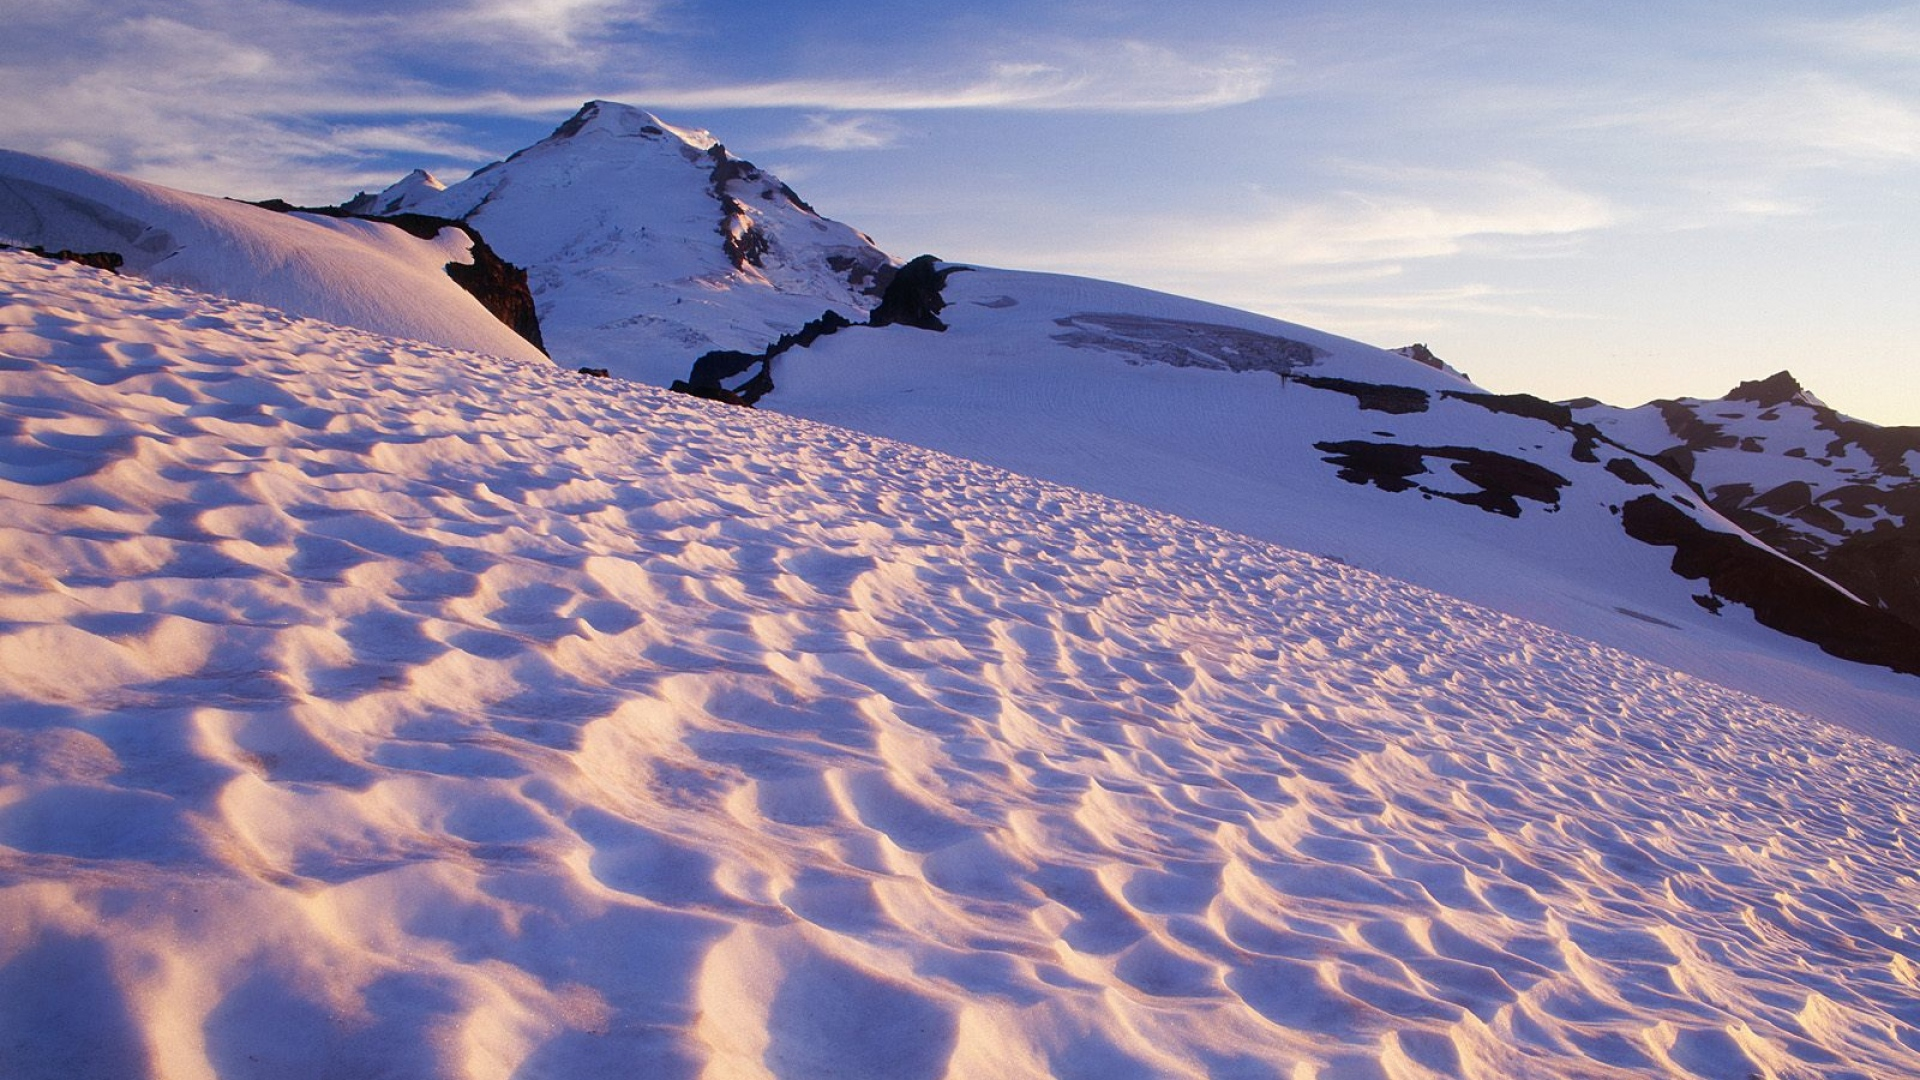 Fantastic Wallpaper Mountain Pattern - mountains_snow_cover_pattern_4748_1920x1080  Photograph_2902.jpg